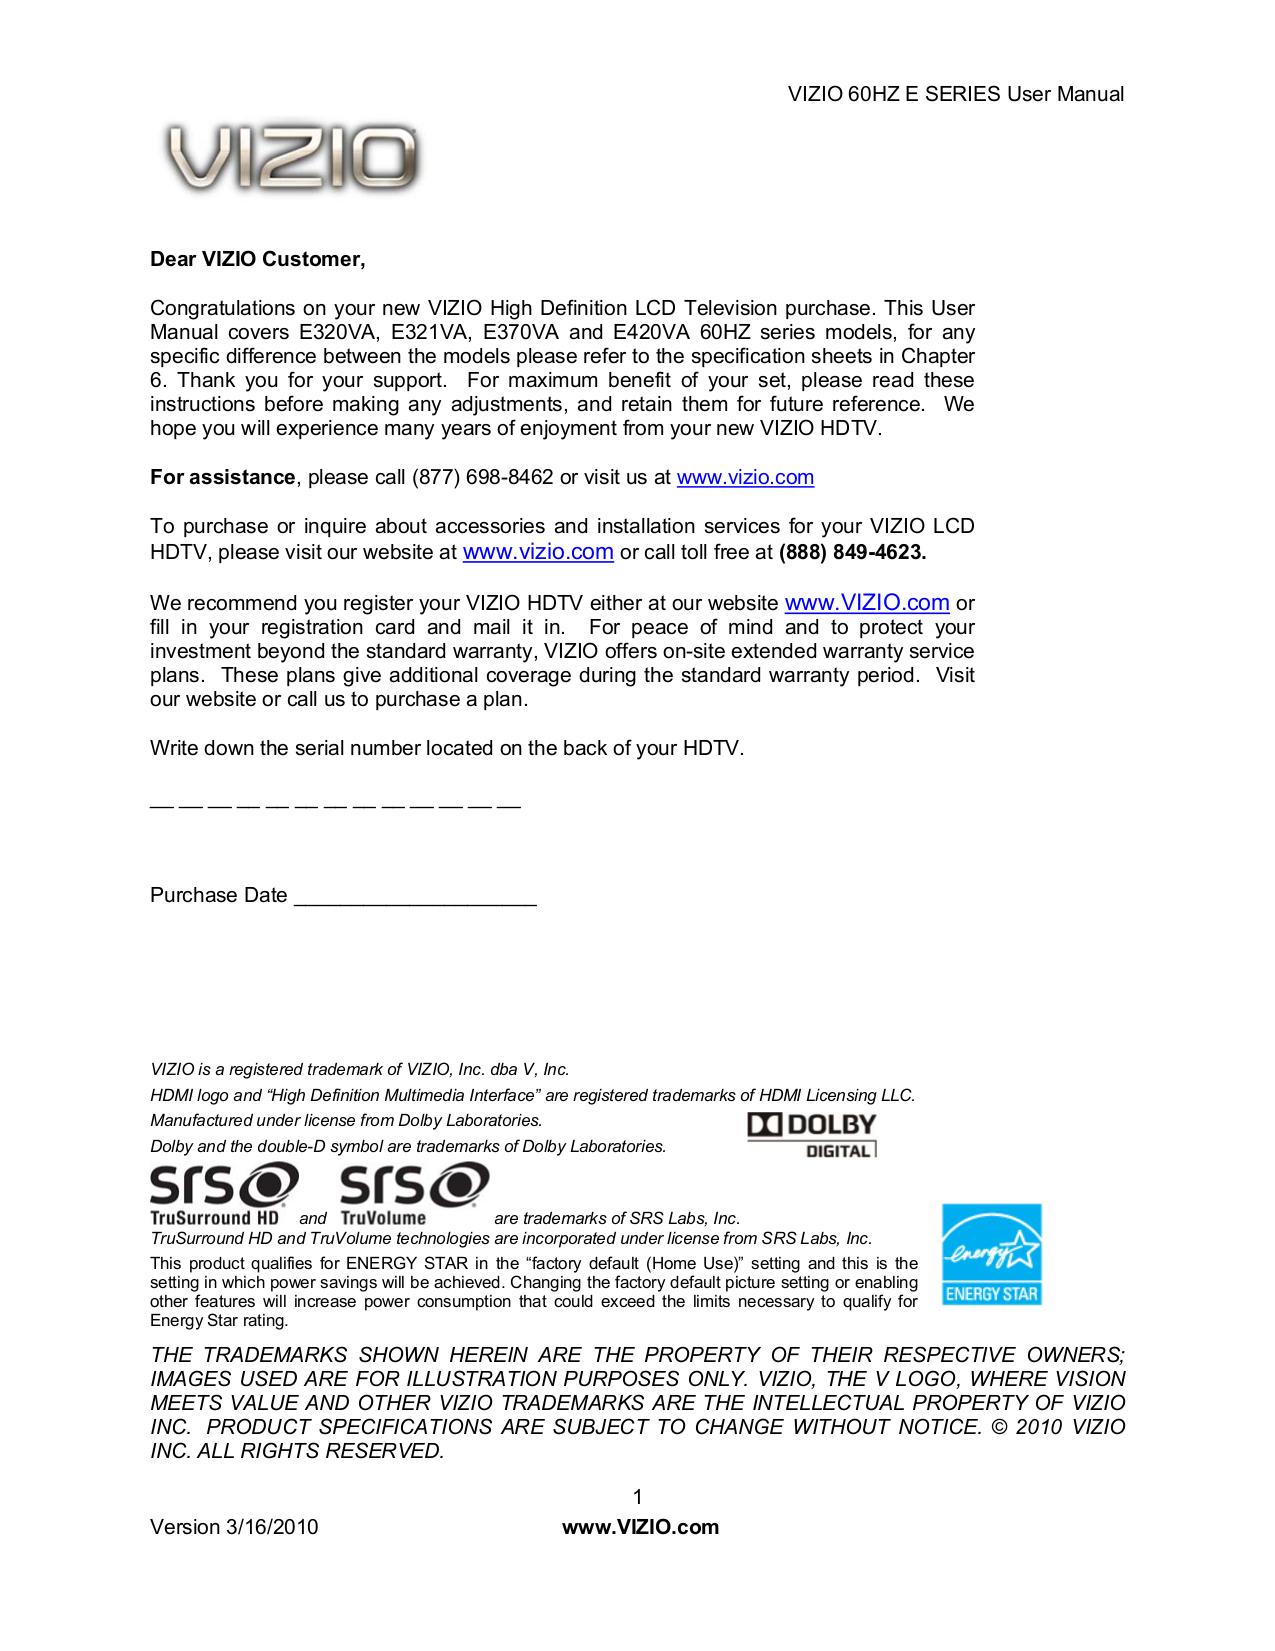 Download free pdf for Hyundai E320D TV manual